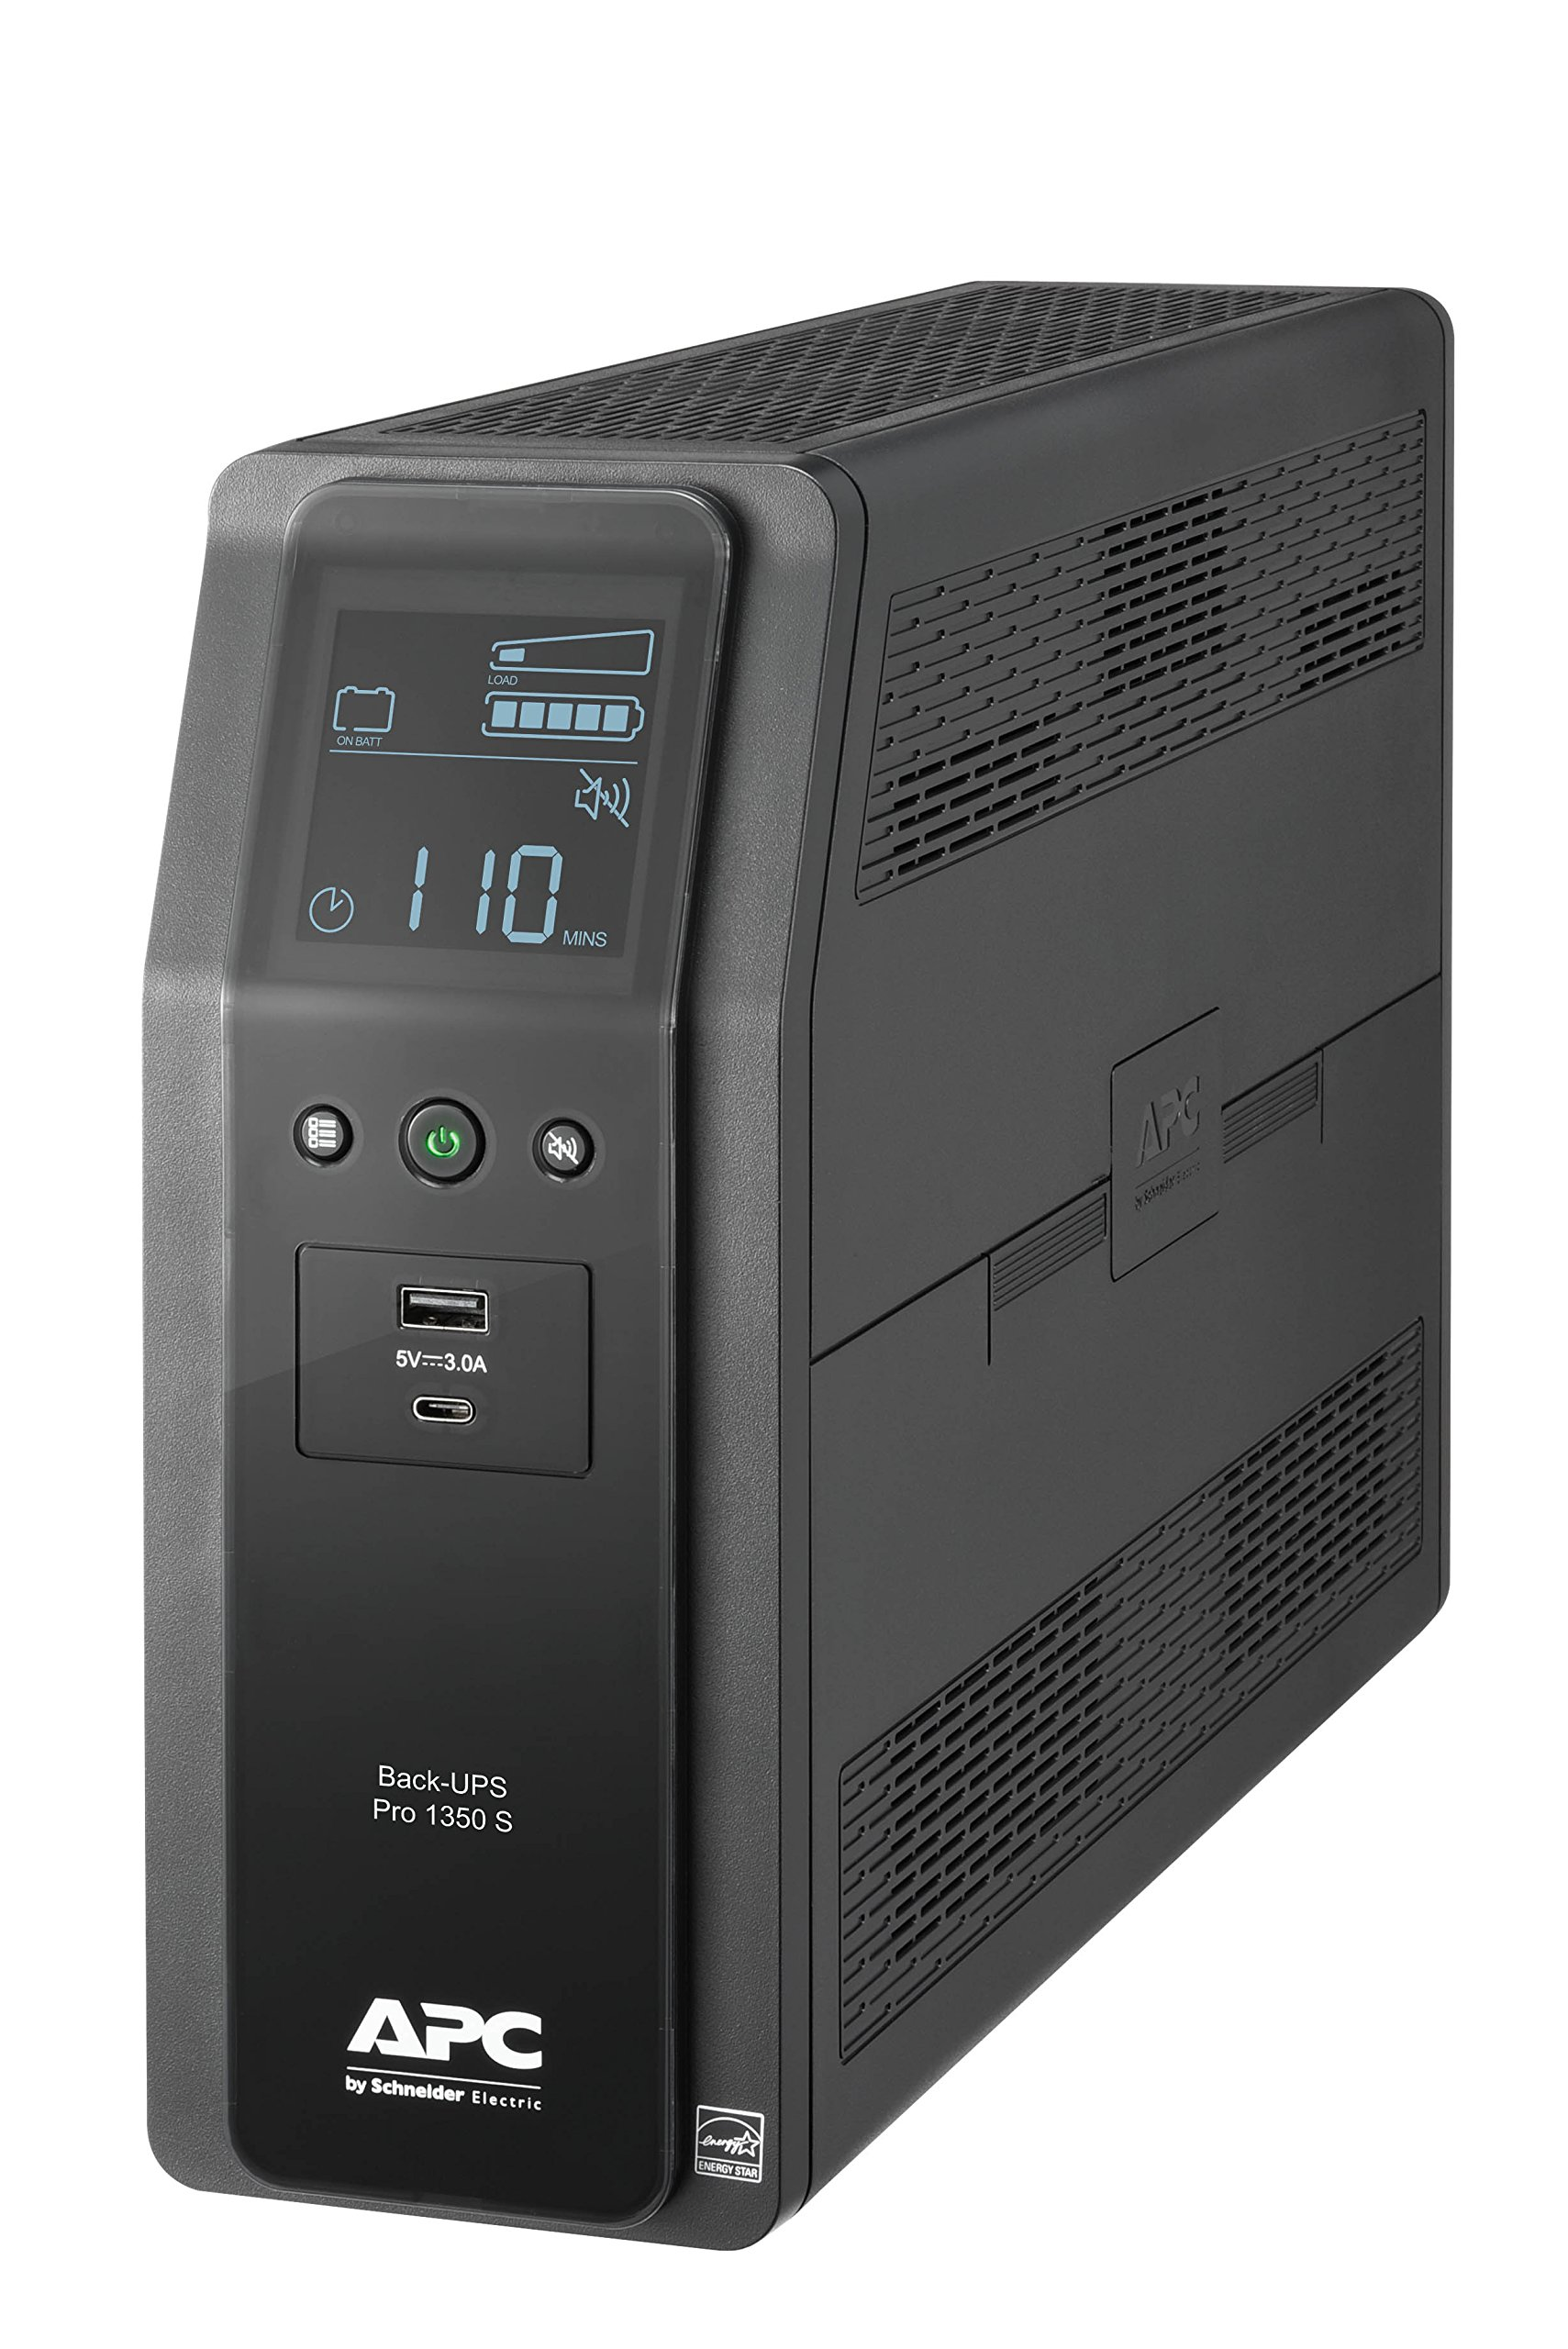 APC UPS BR1350MS, 1350VA Sine Wave UPS Battery Backup Surge Protector, Backup Battery with AVR and LCD Display, 2 USB Charging Ports, Uninterruptible Power Supply, APC Back-UPS Pro Series